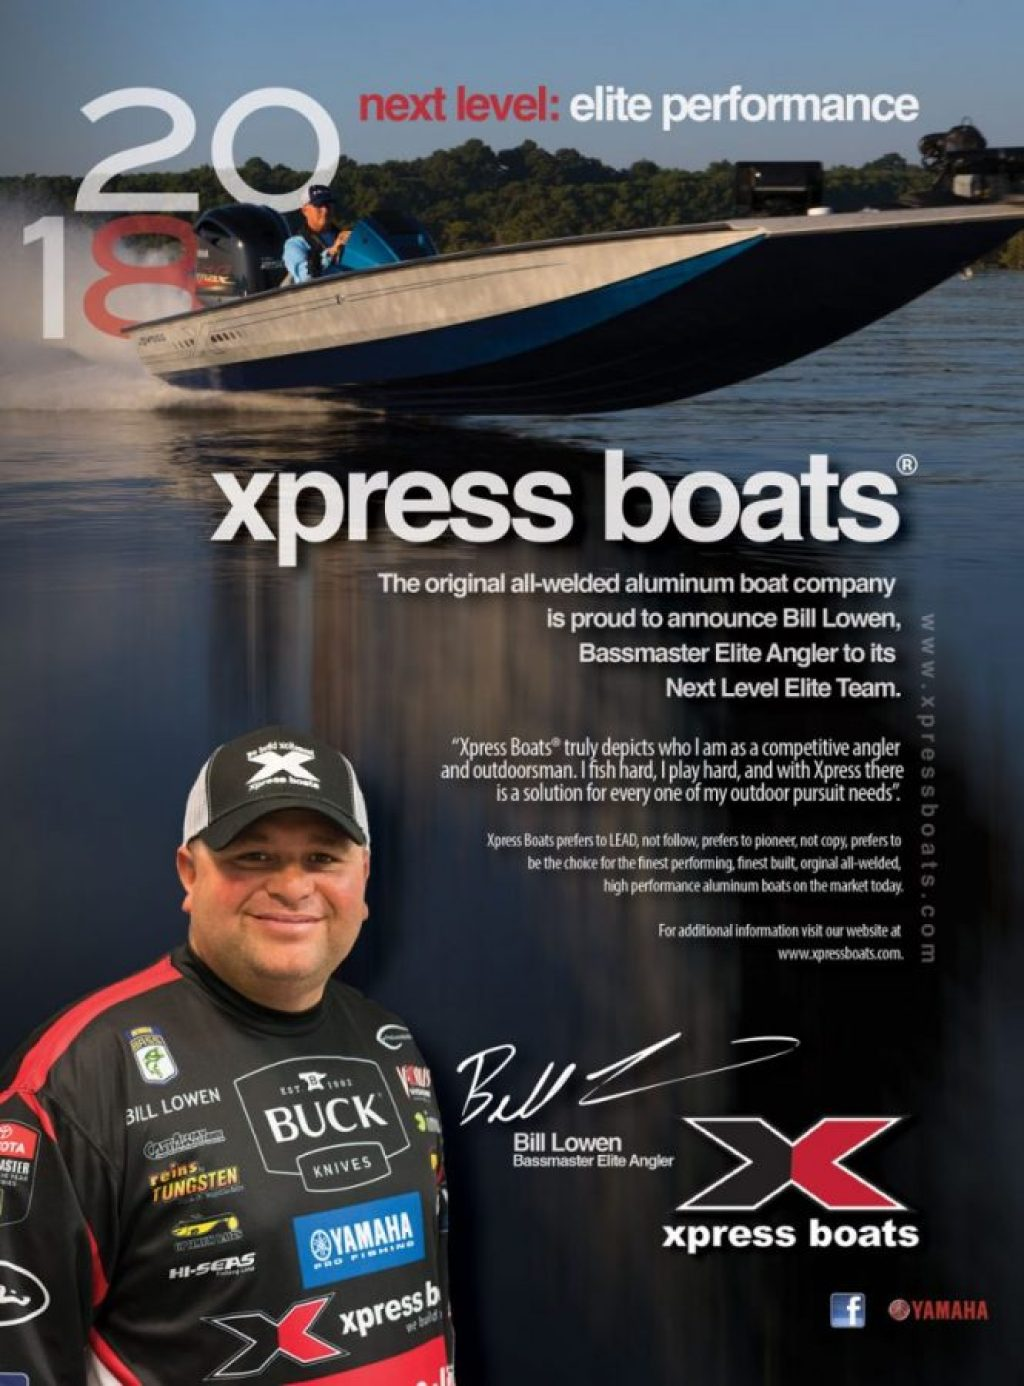 press boats